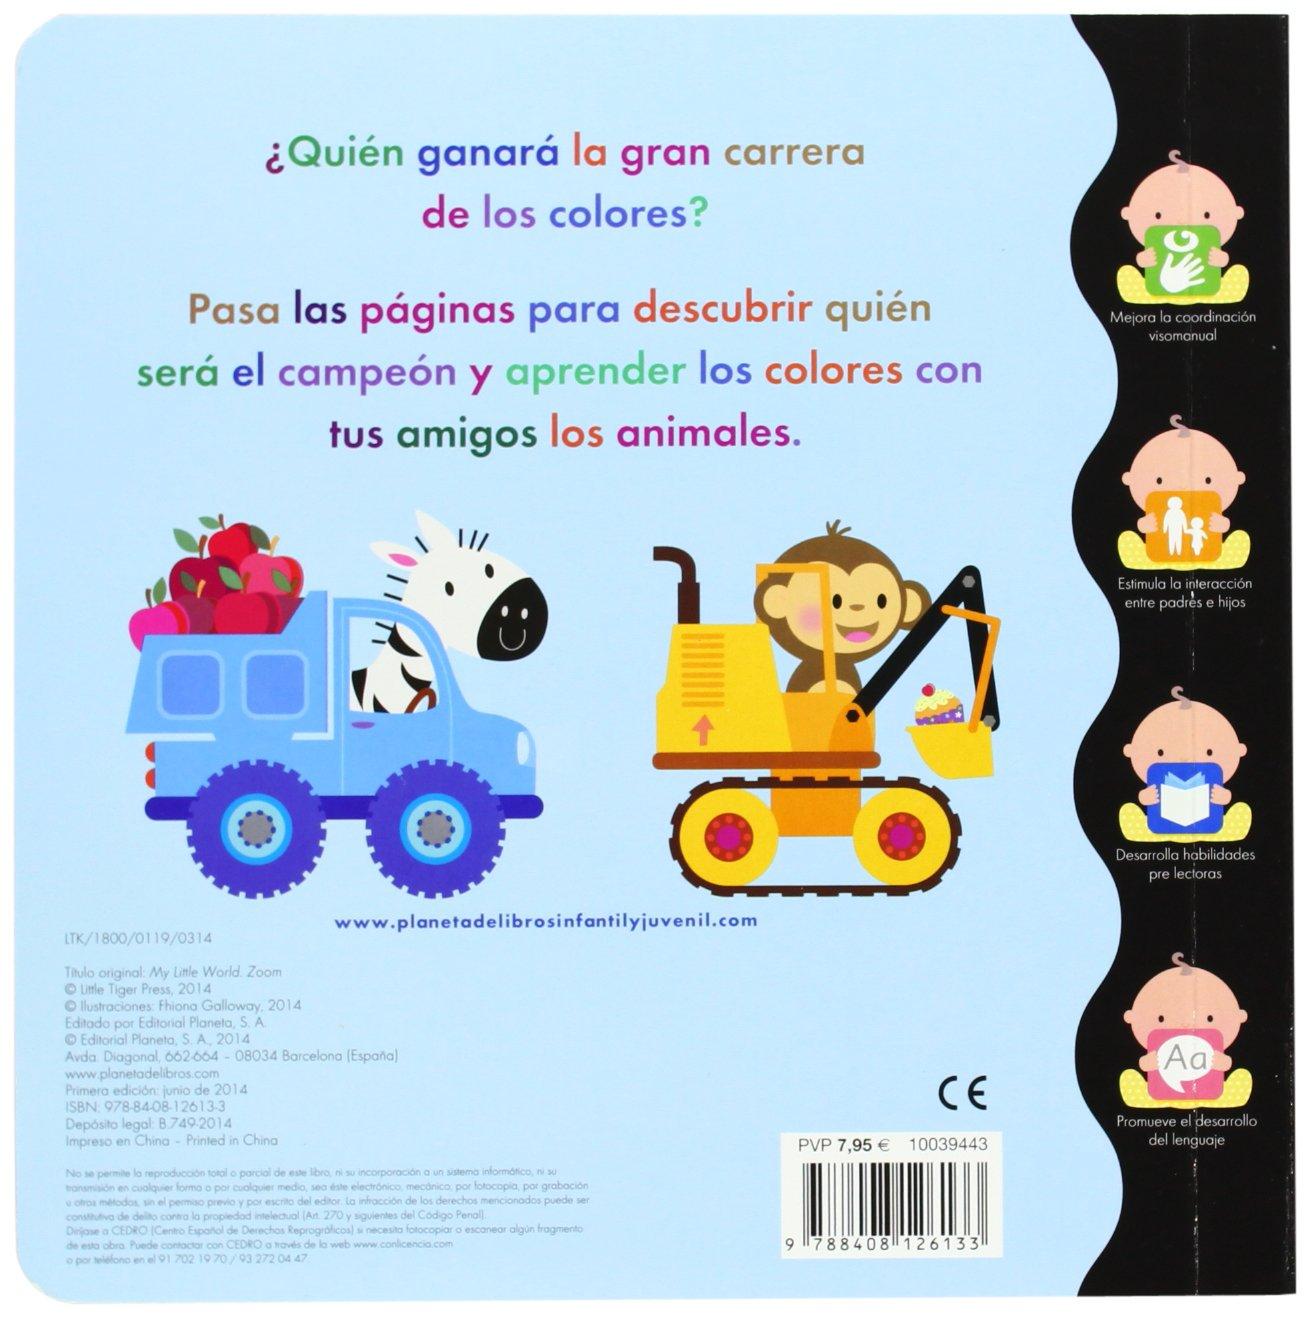 Mi pequeño mundo. Colores (Spanish Edition): Planeta, Timunmas: 9788408126133: Amazon.com: Books